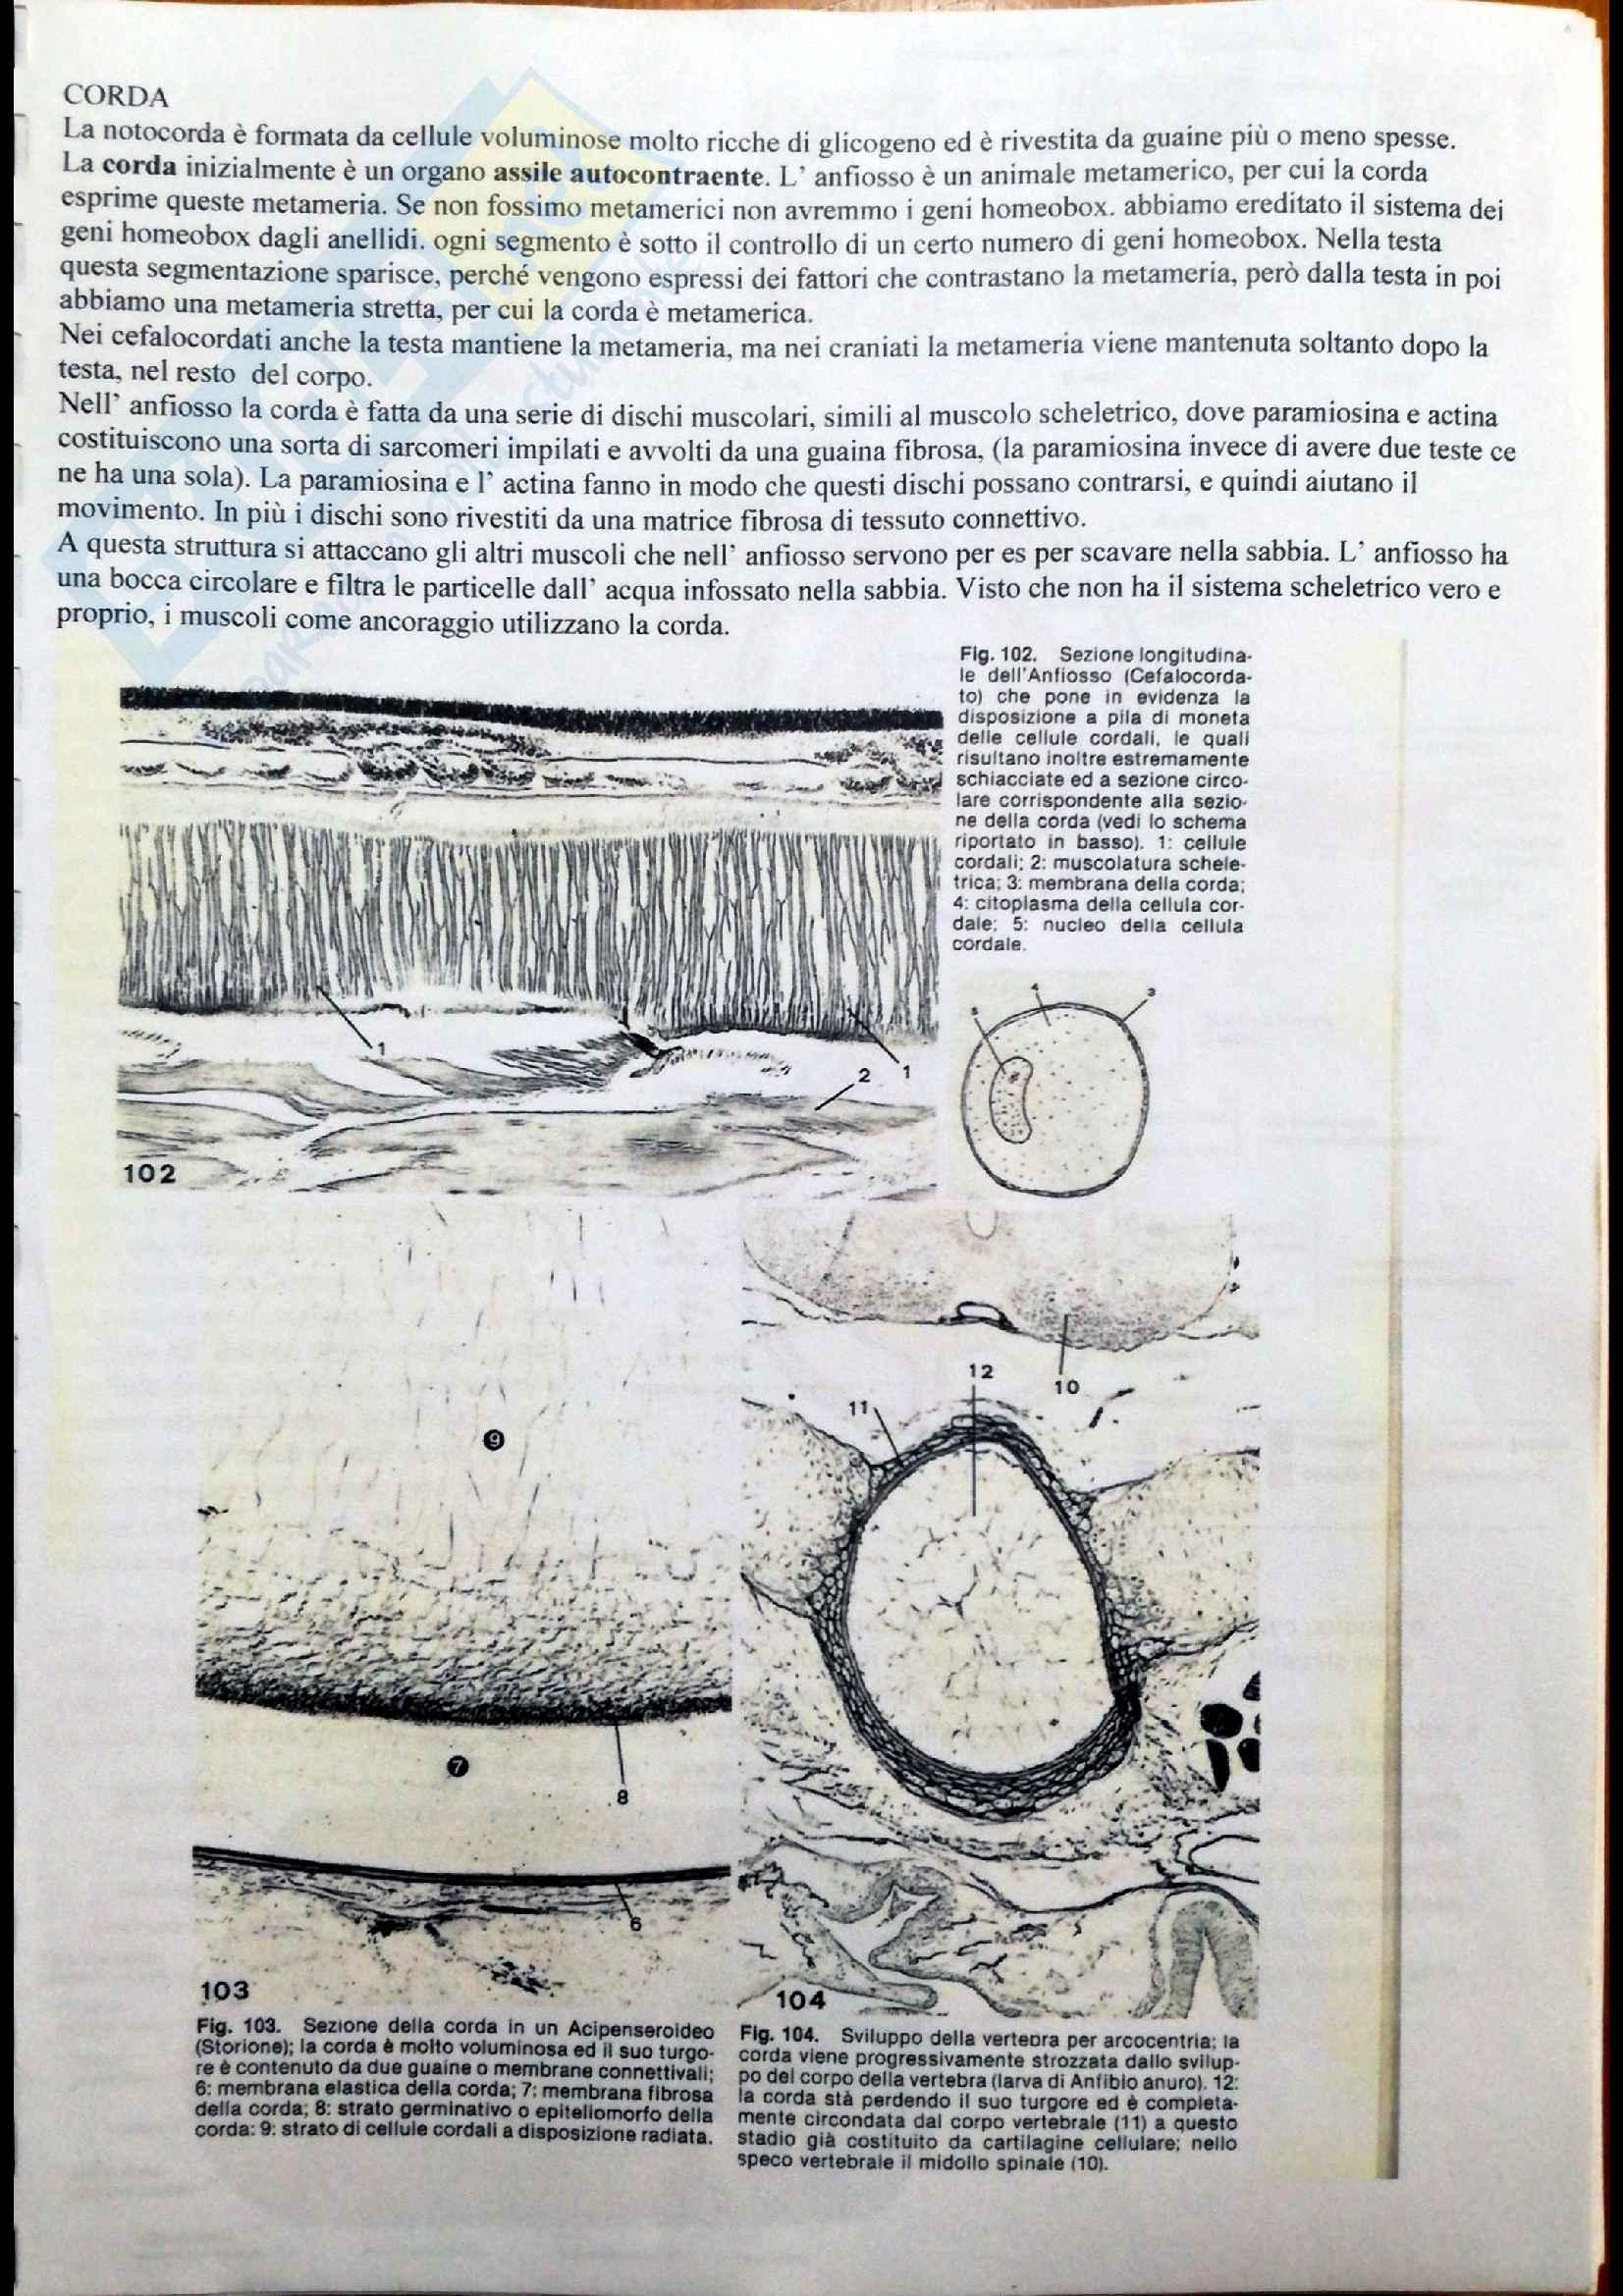 Sistema scheletrico, Anatomia comparata